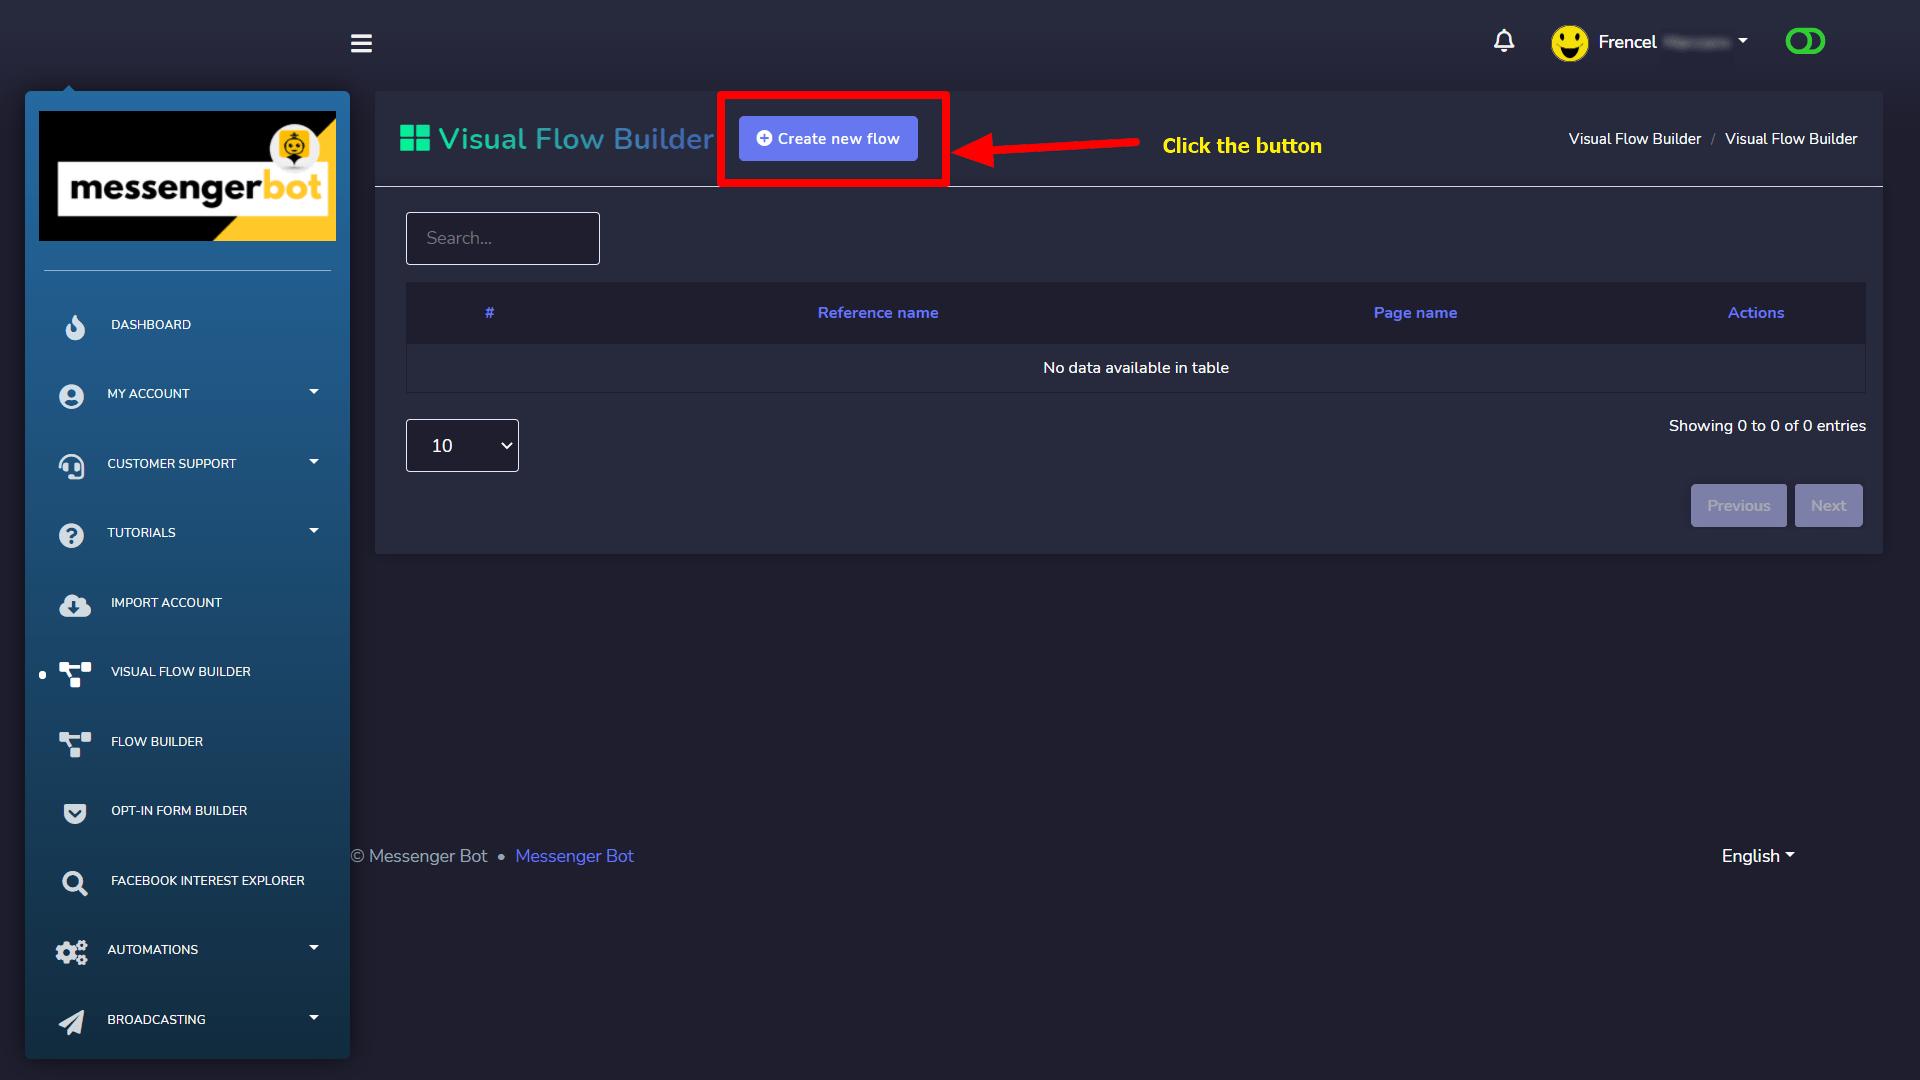 Messenger Bot - Visual Flow Builder 2